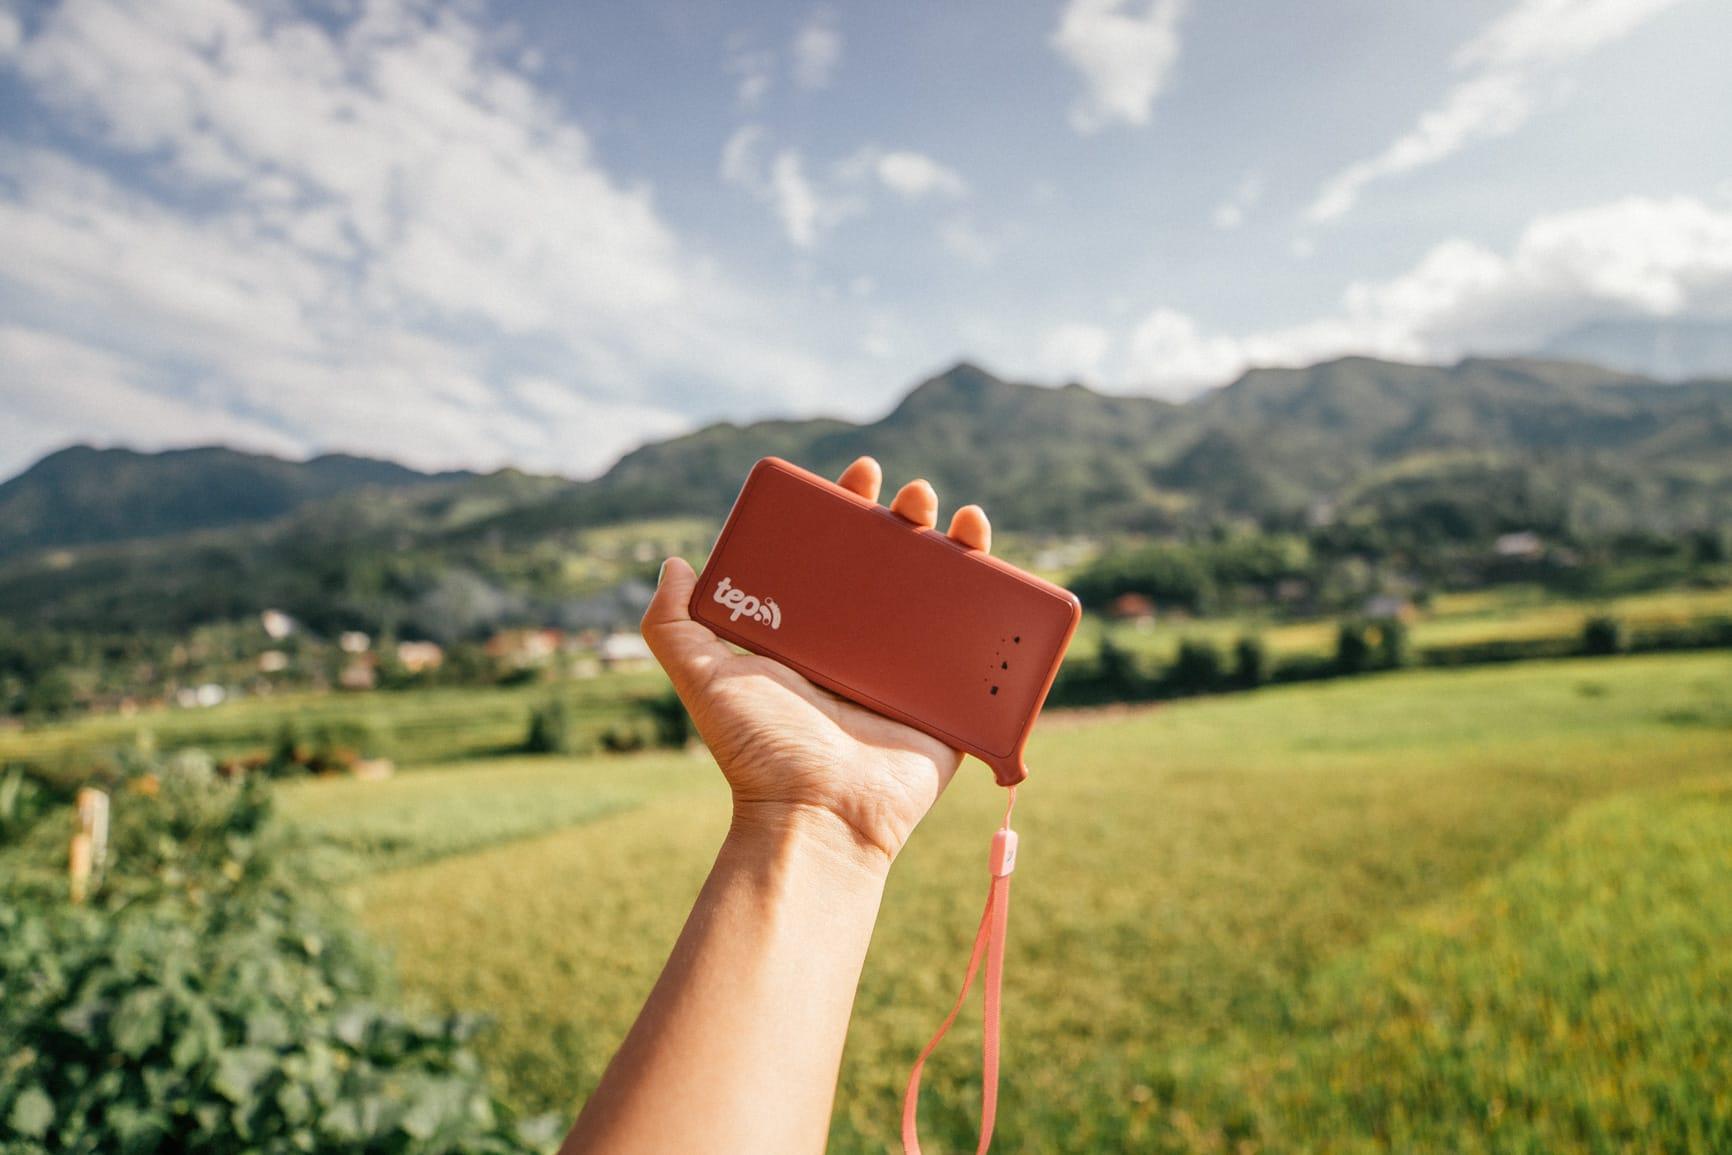 tep wireless used in Sapa rice fields vietnam | vietnam travel tips